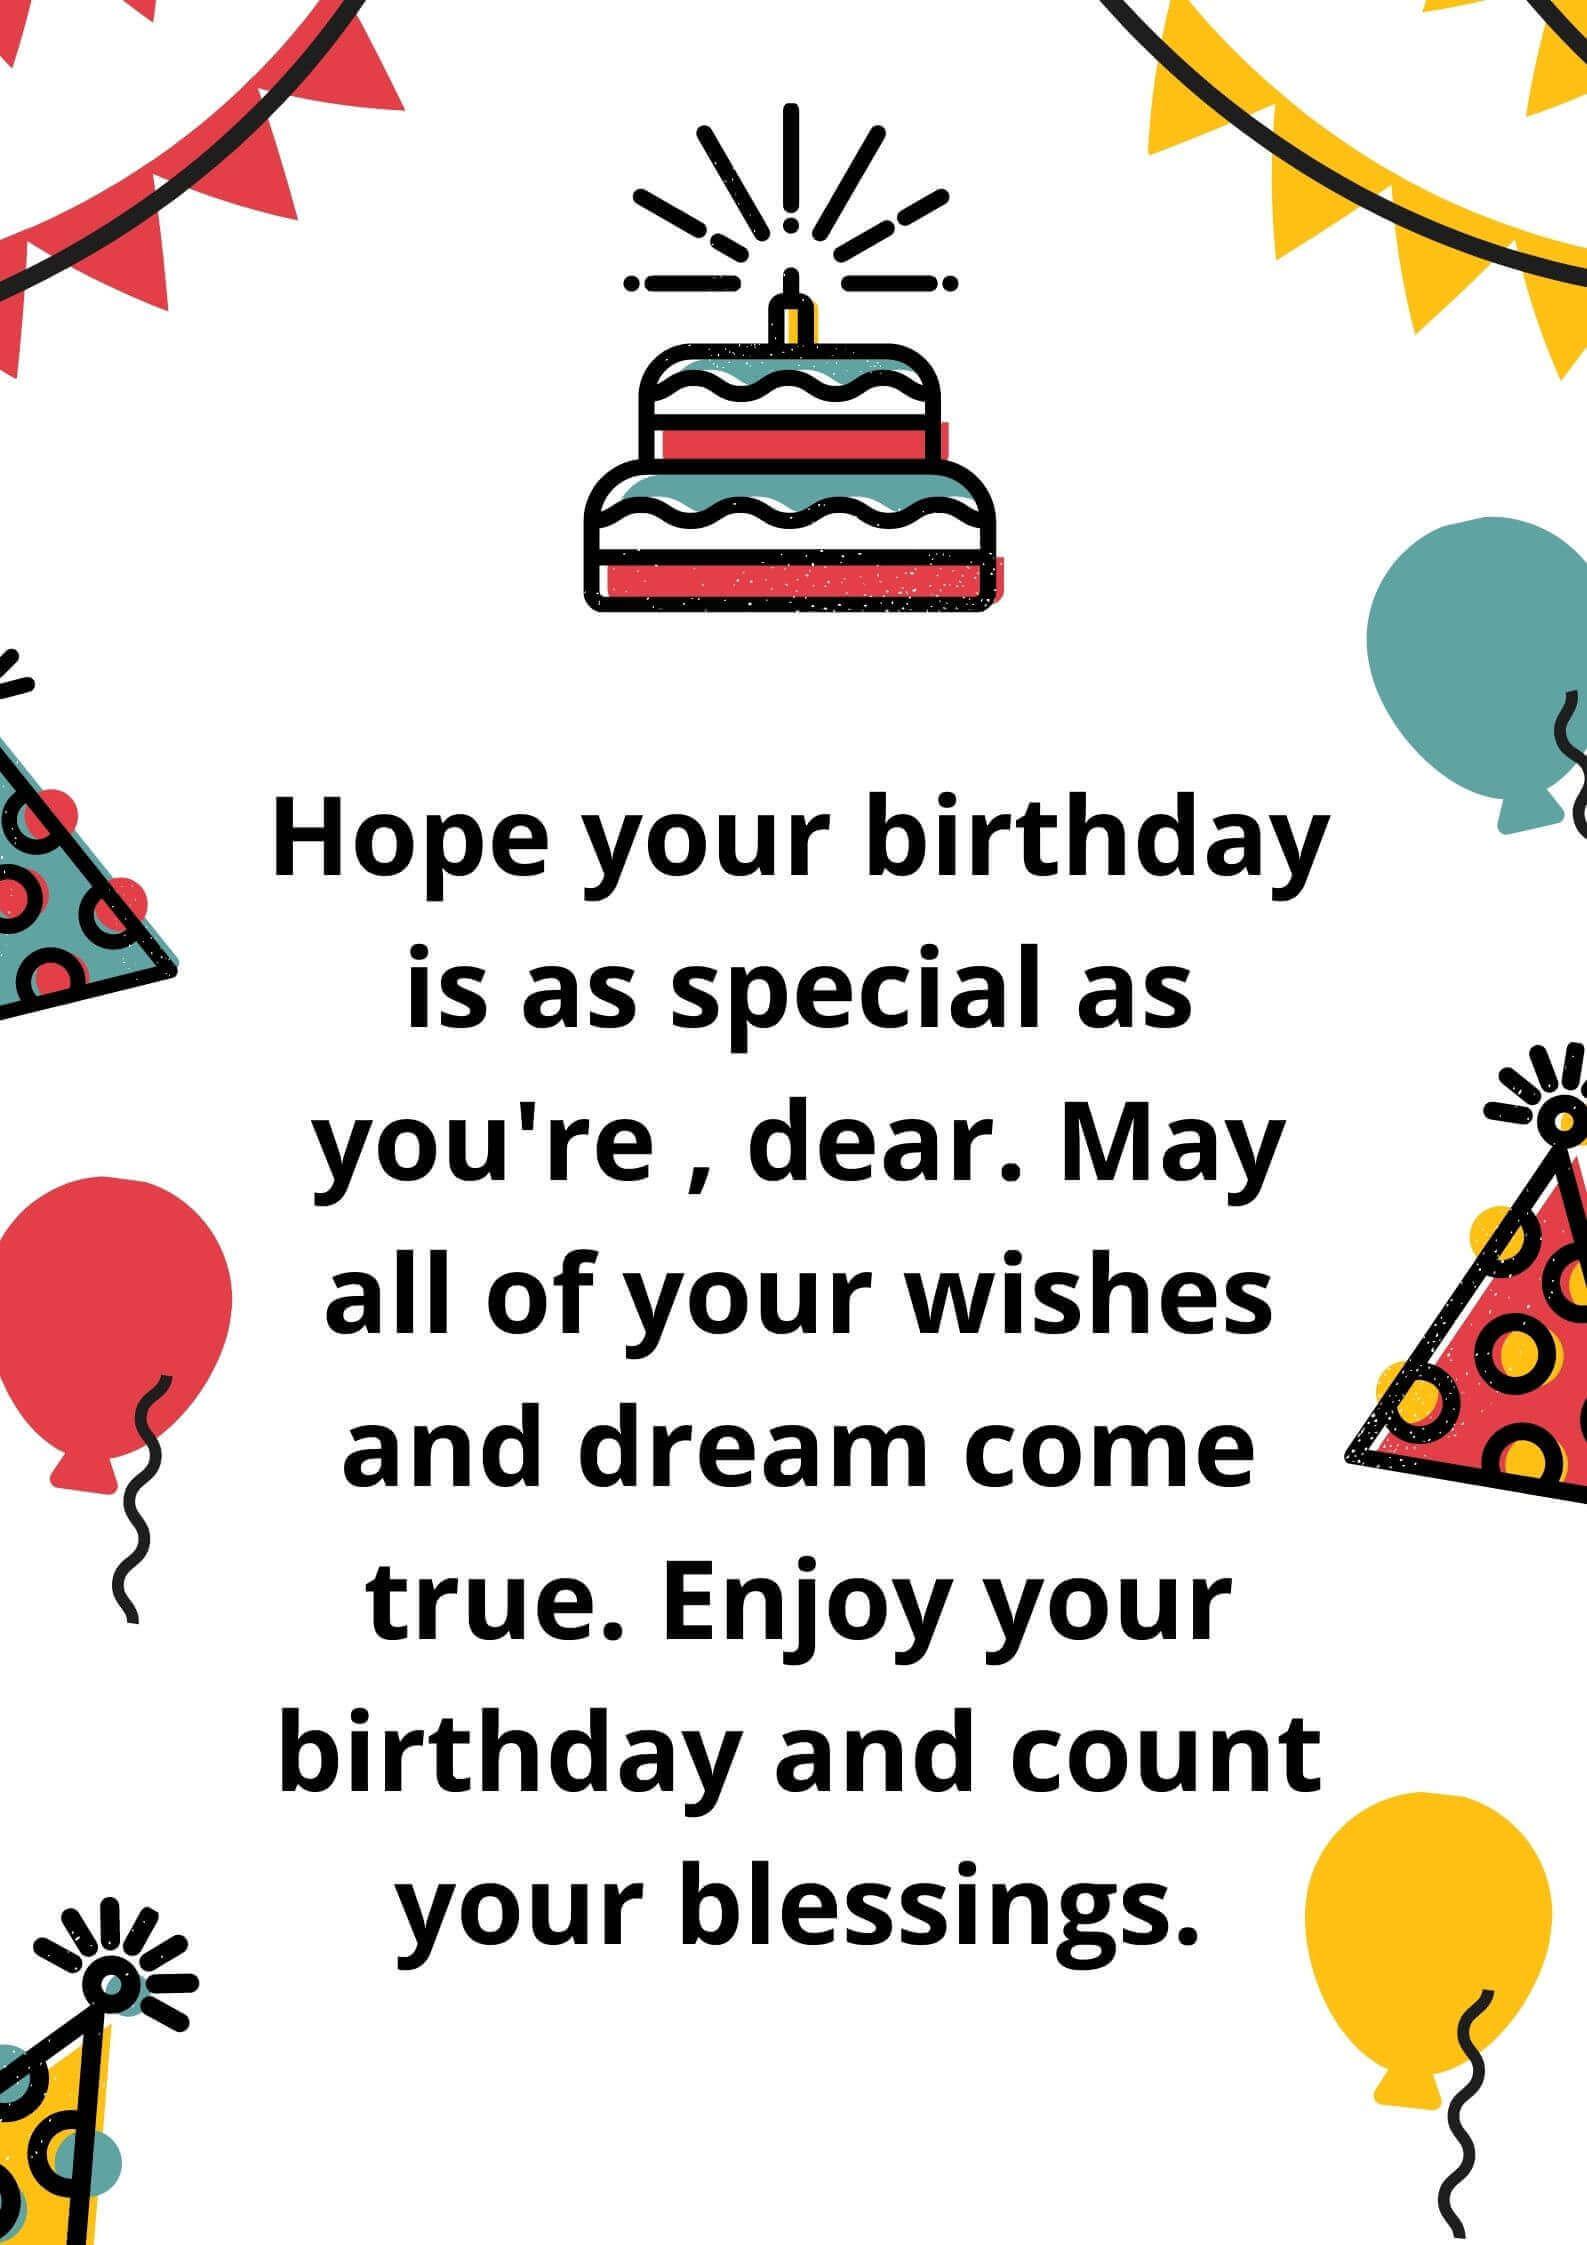 Happy Birthday Wish Image